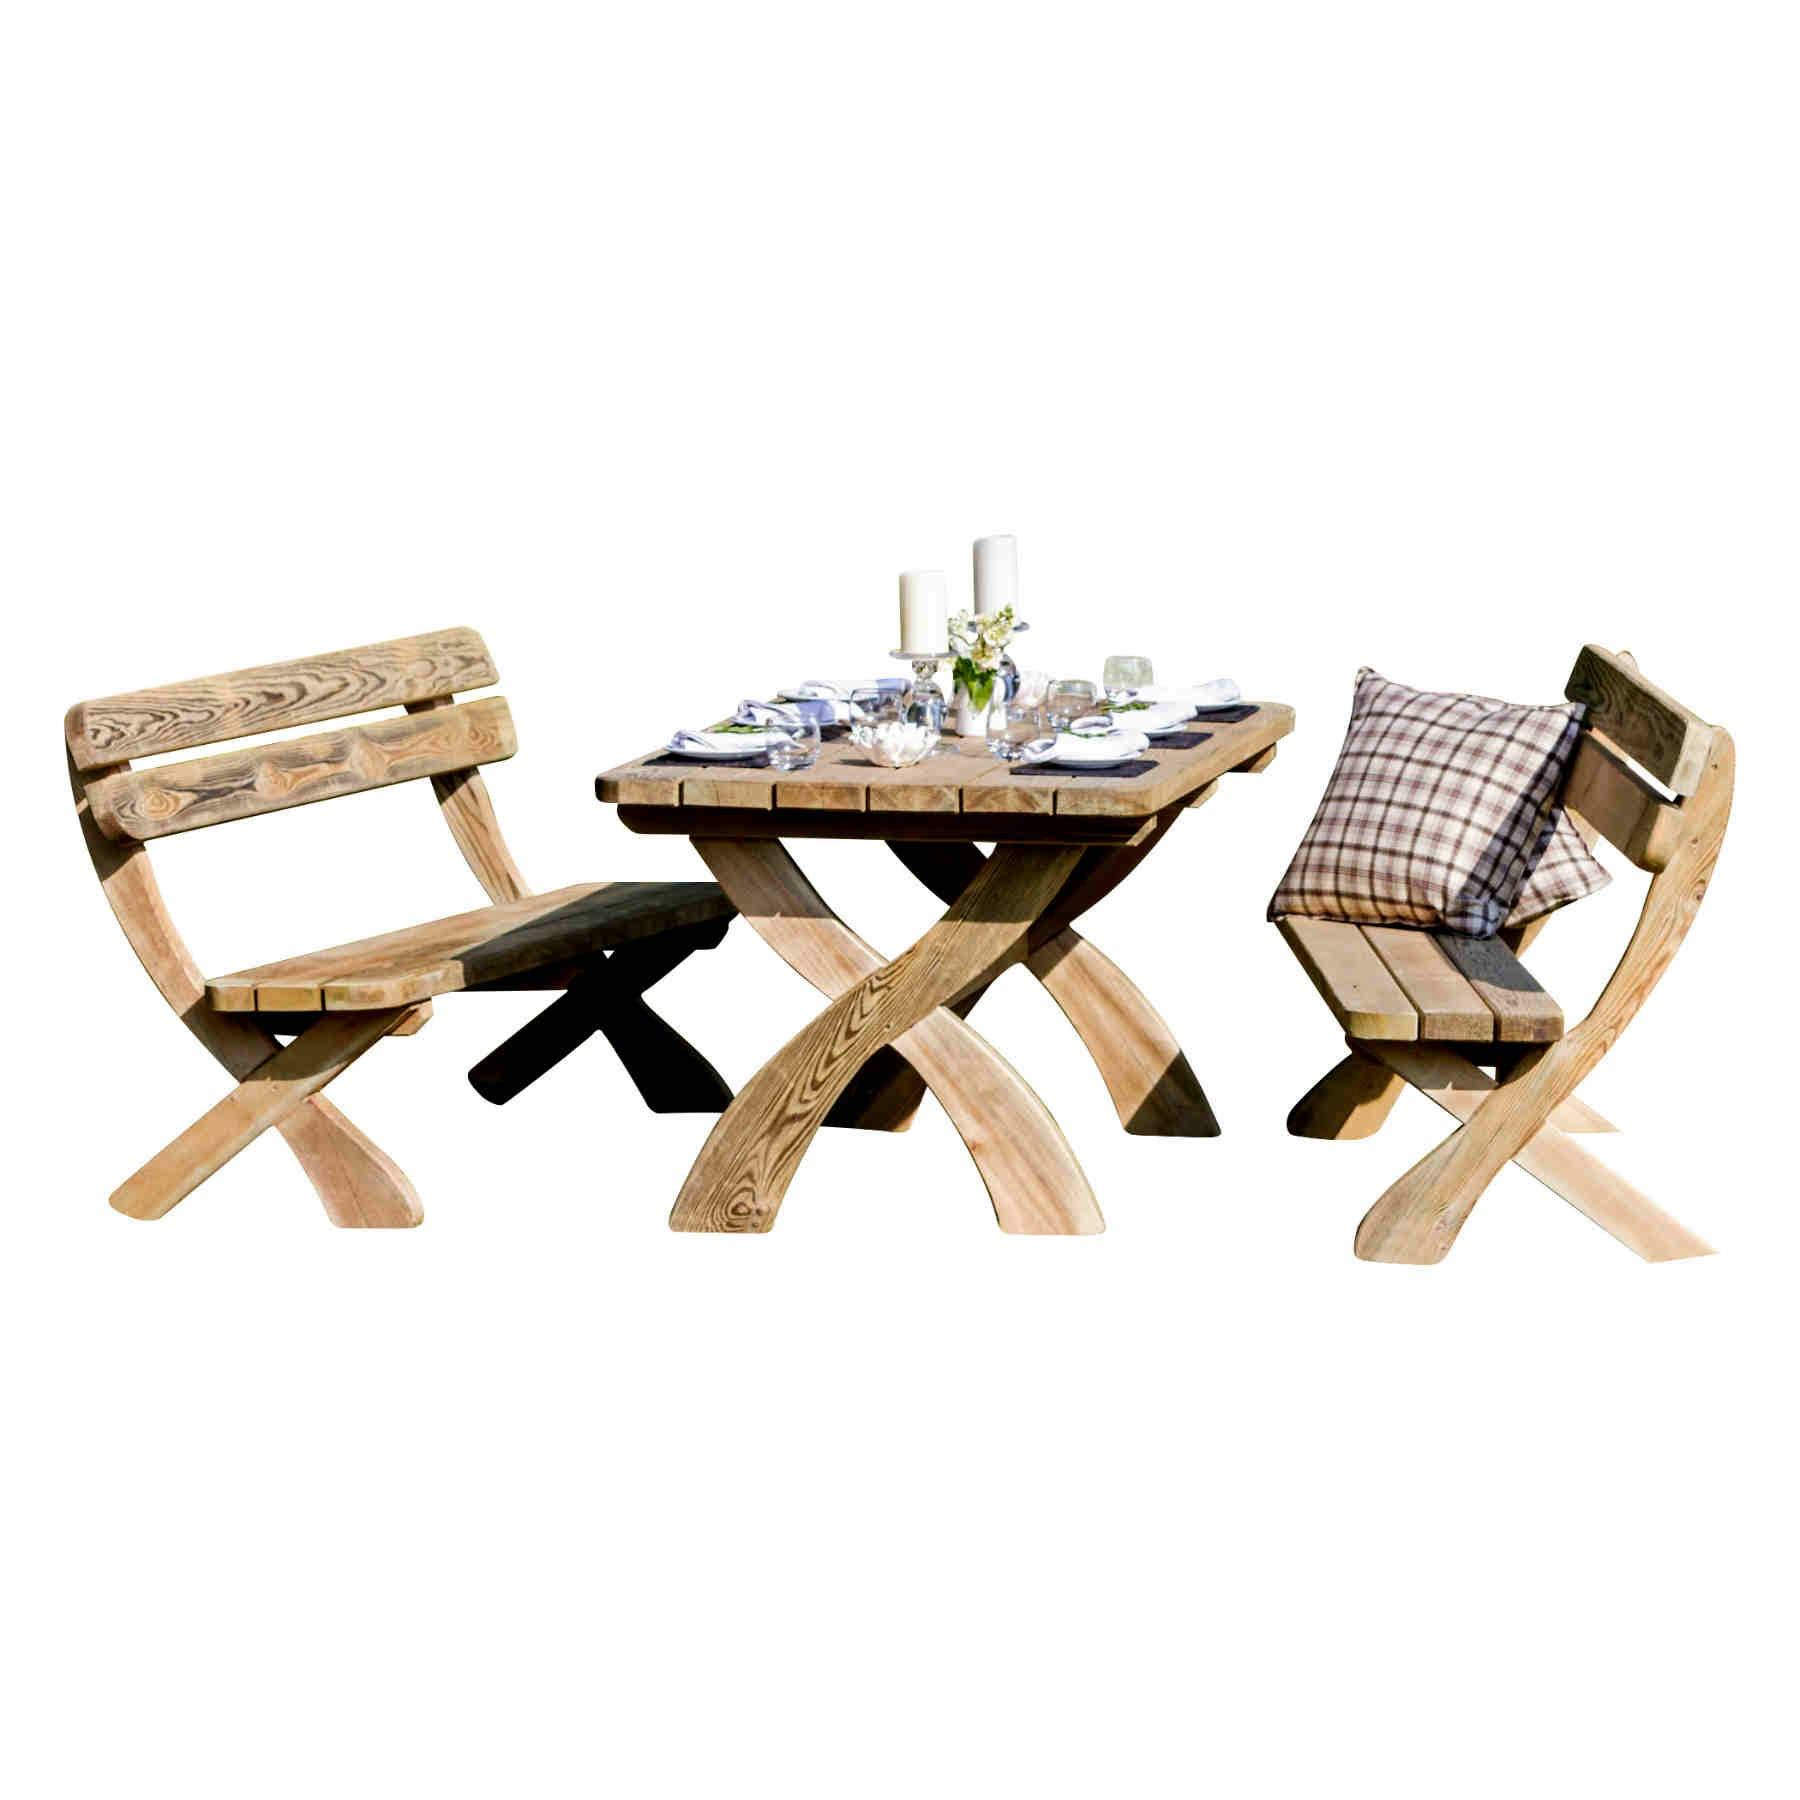 Zest4Leisure Harriet Wooden Garden Dining Table and Bench Set